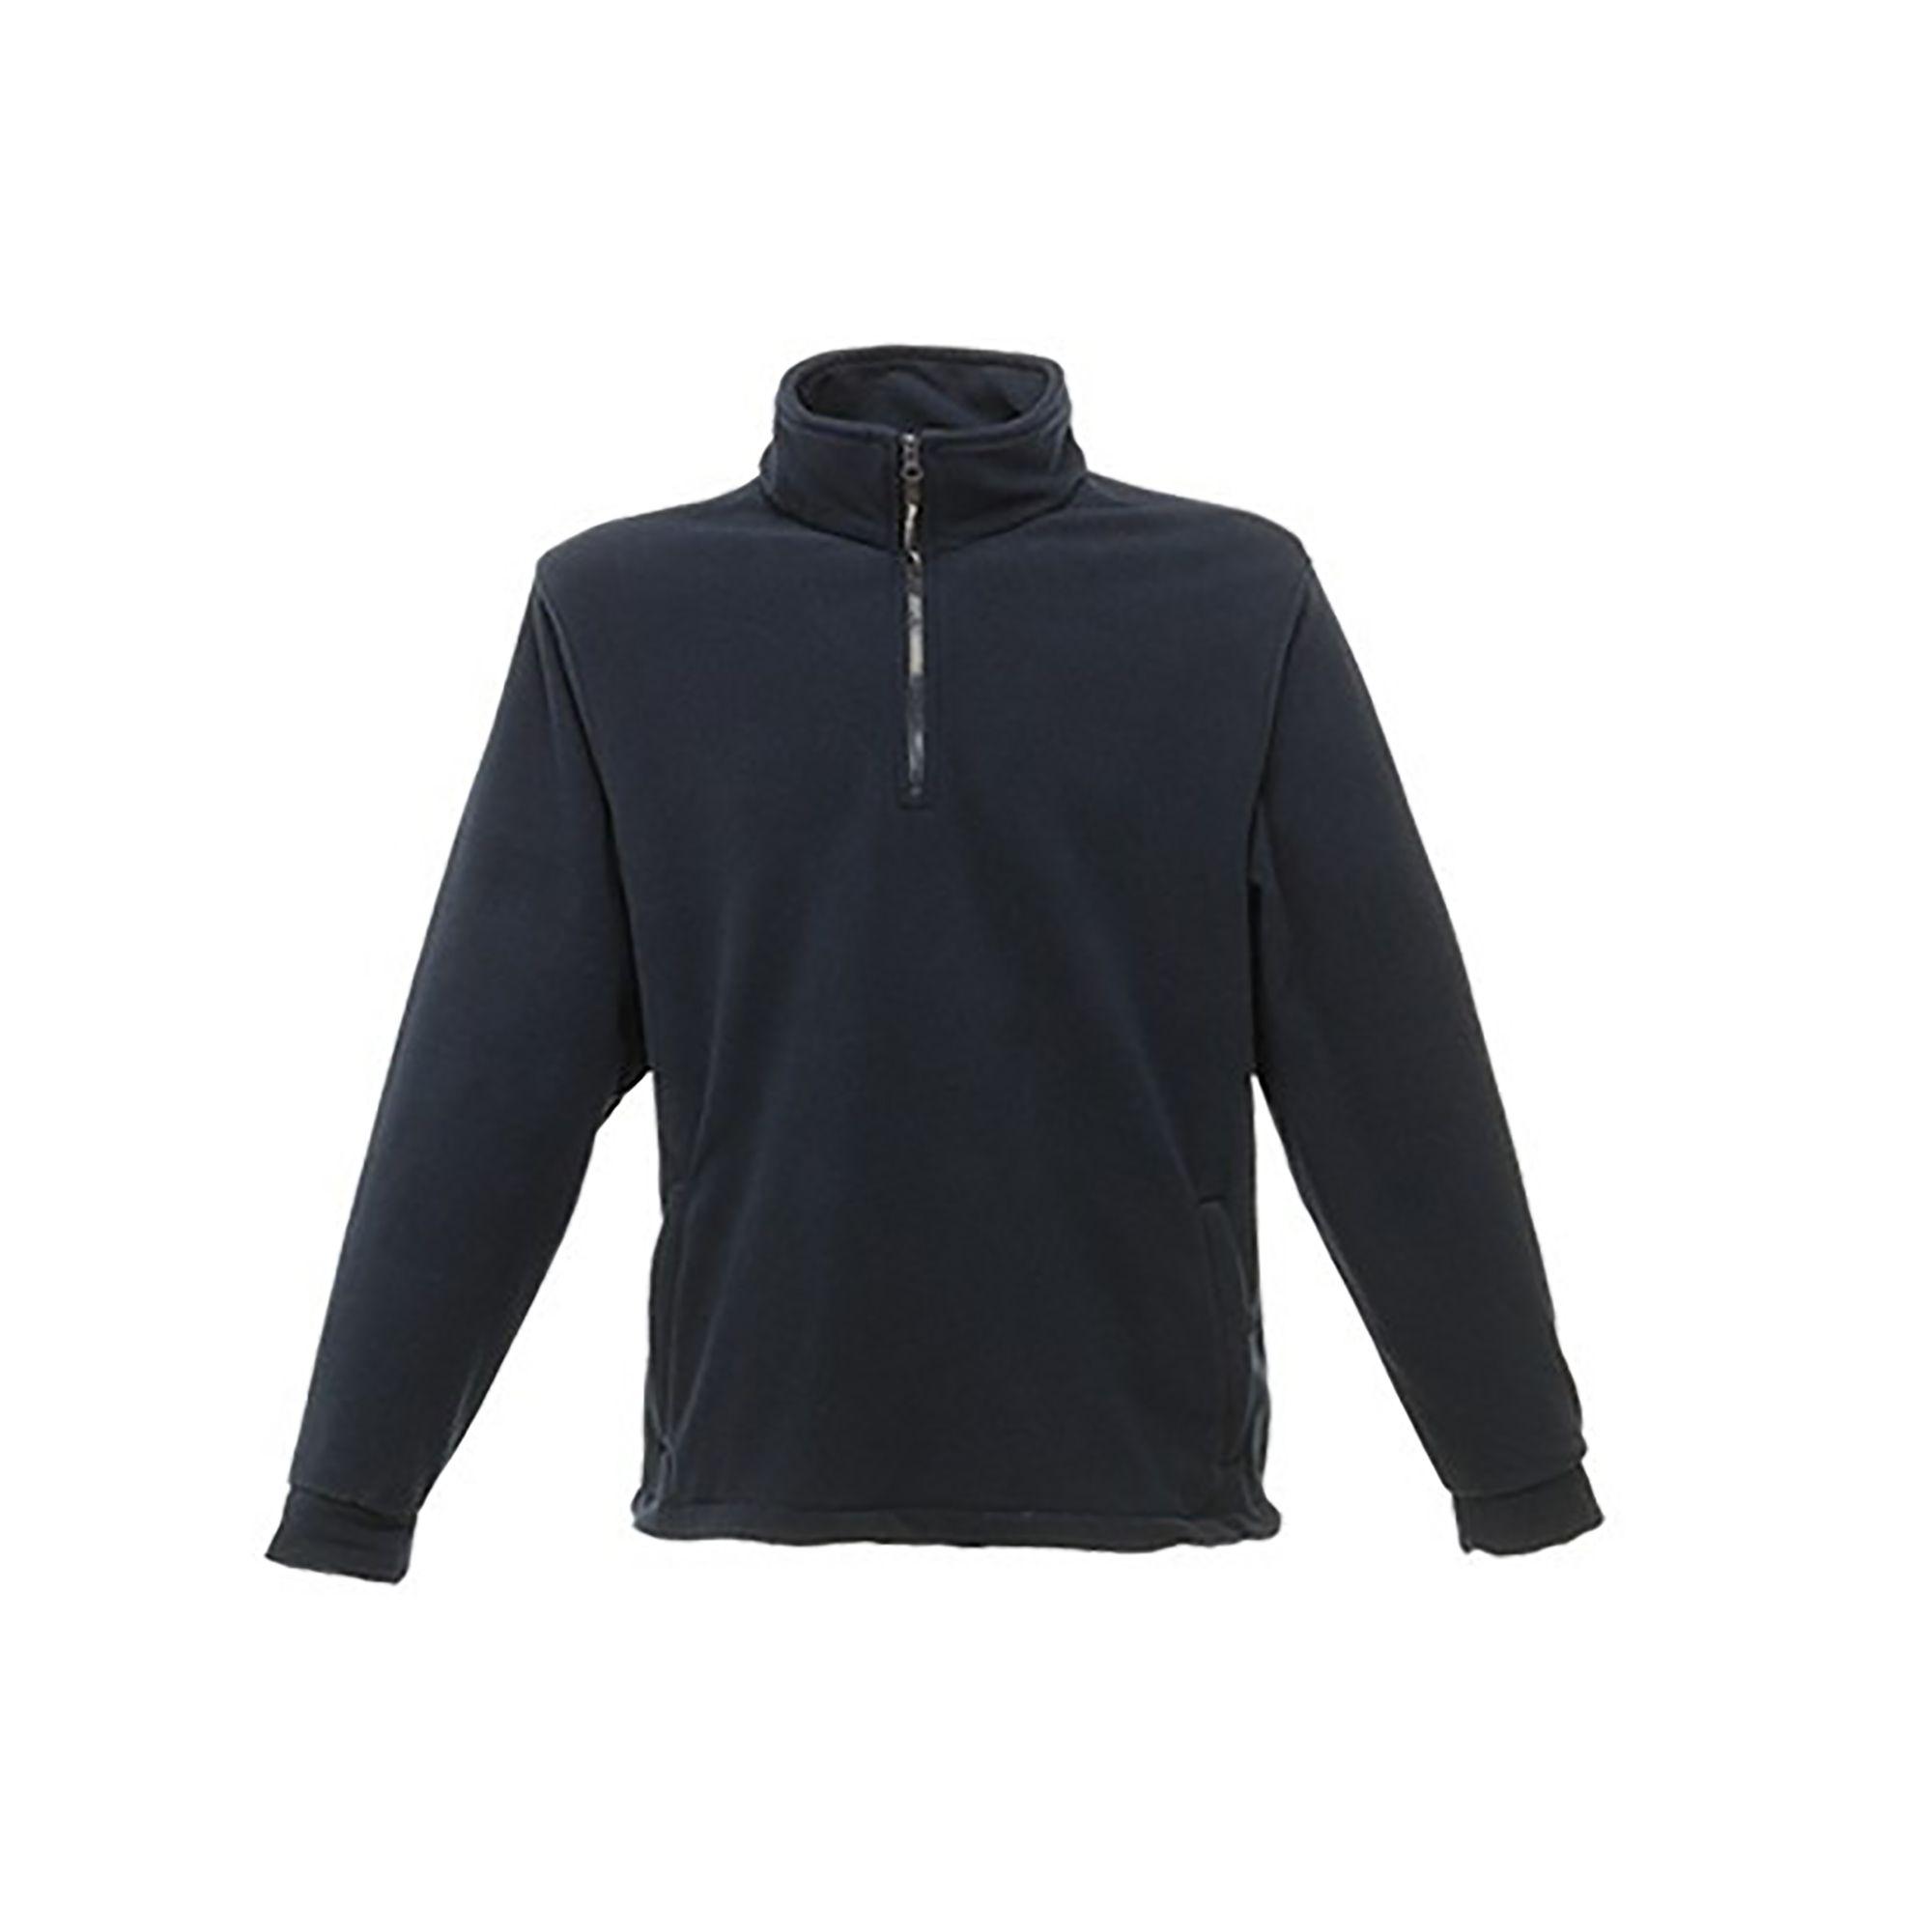 Regatta Great Outdoors Unisex Thor Overhead Half Zip Anti-Pill Fleece Sweater (170 GSM)